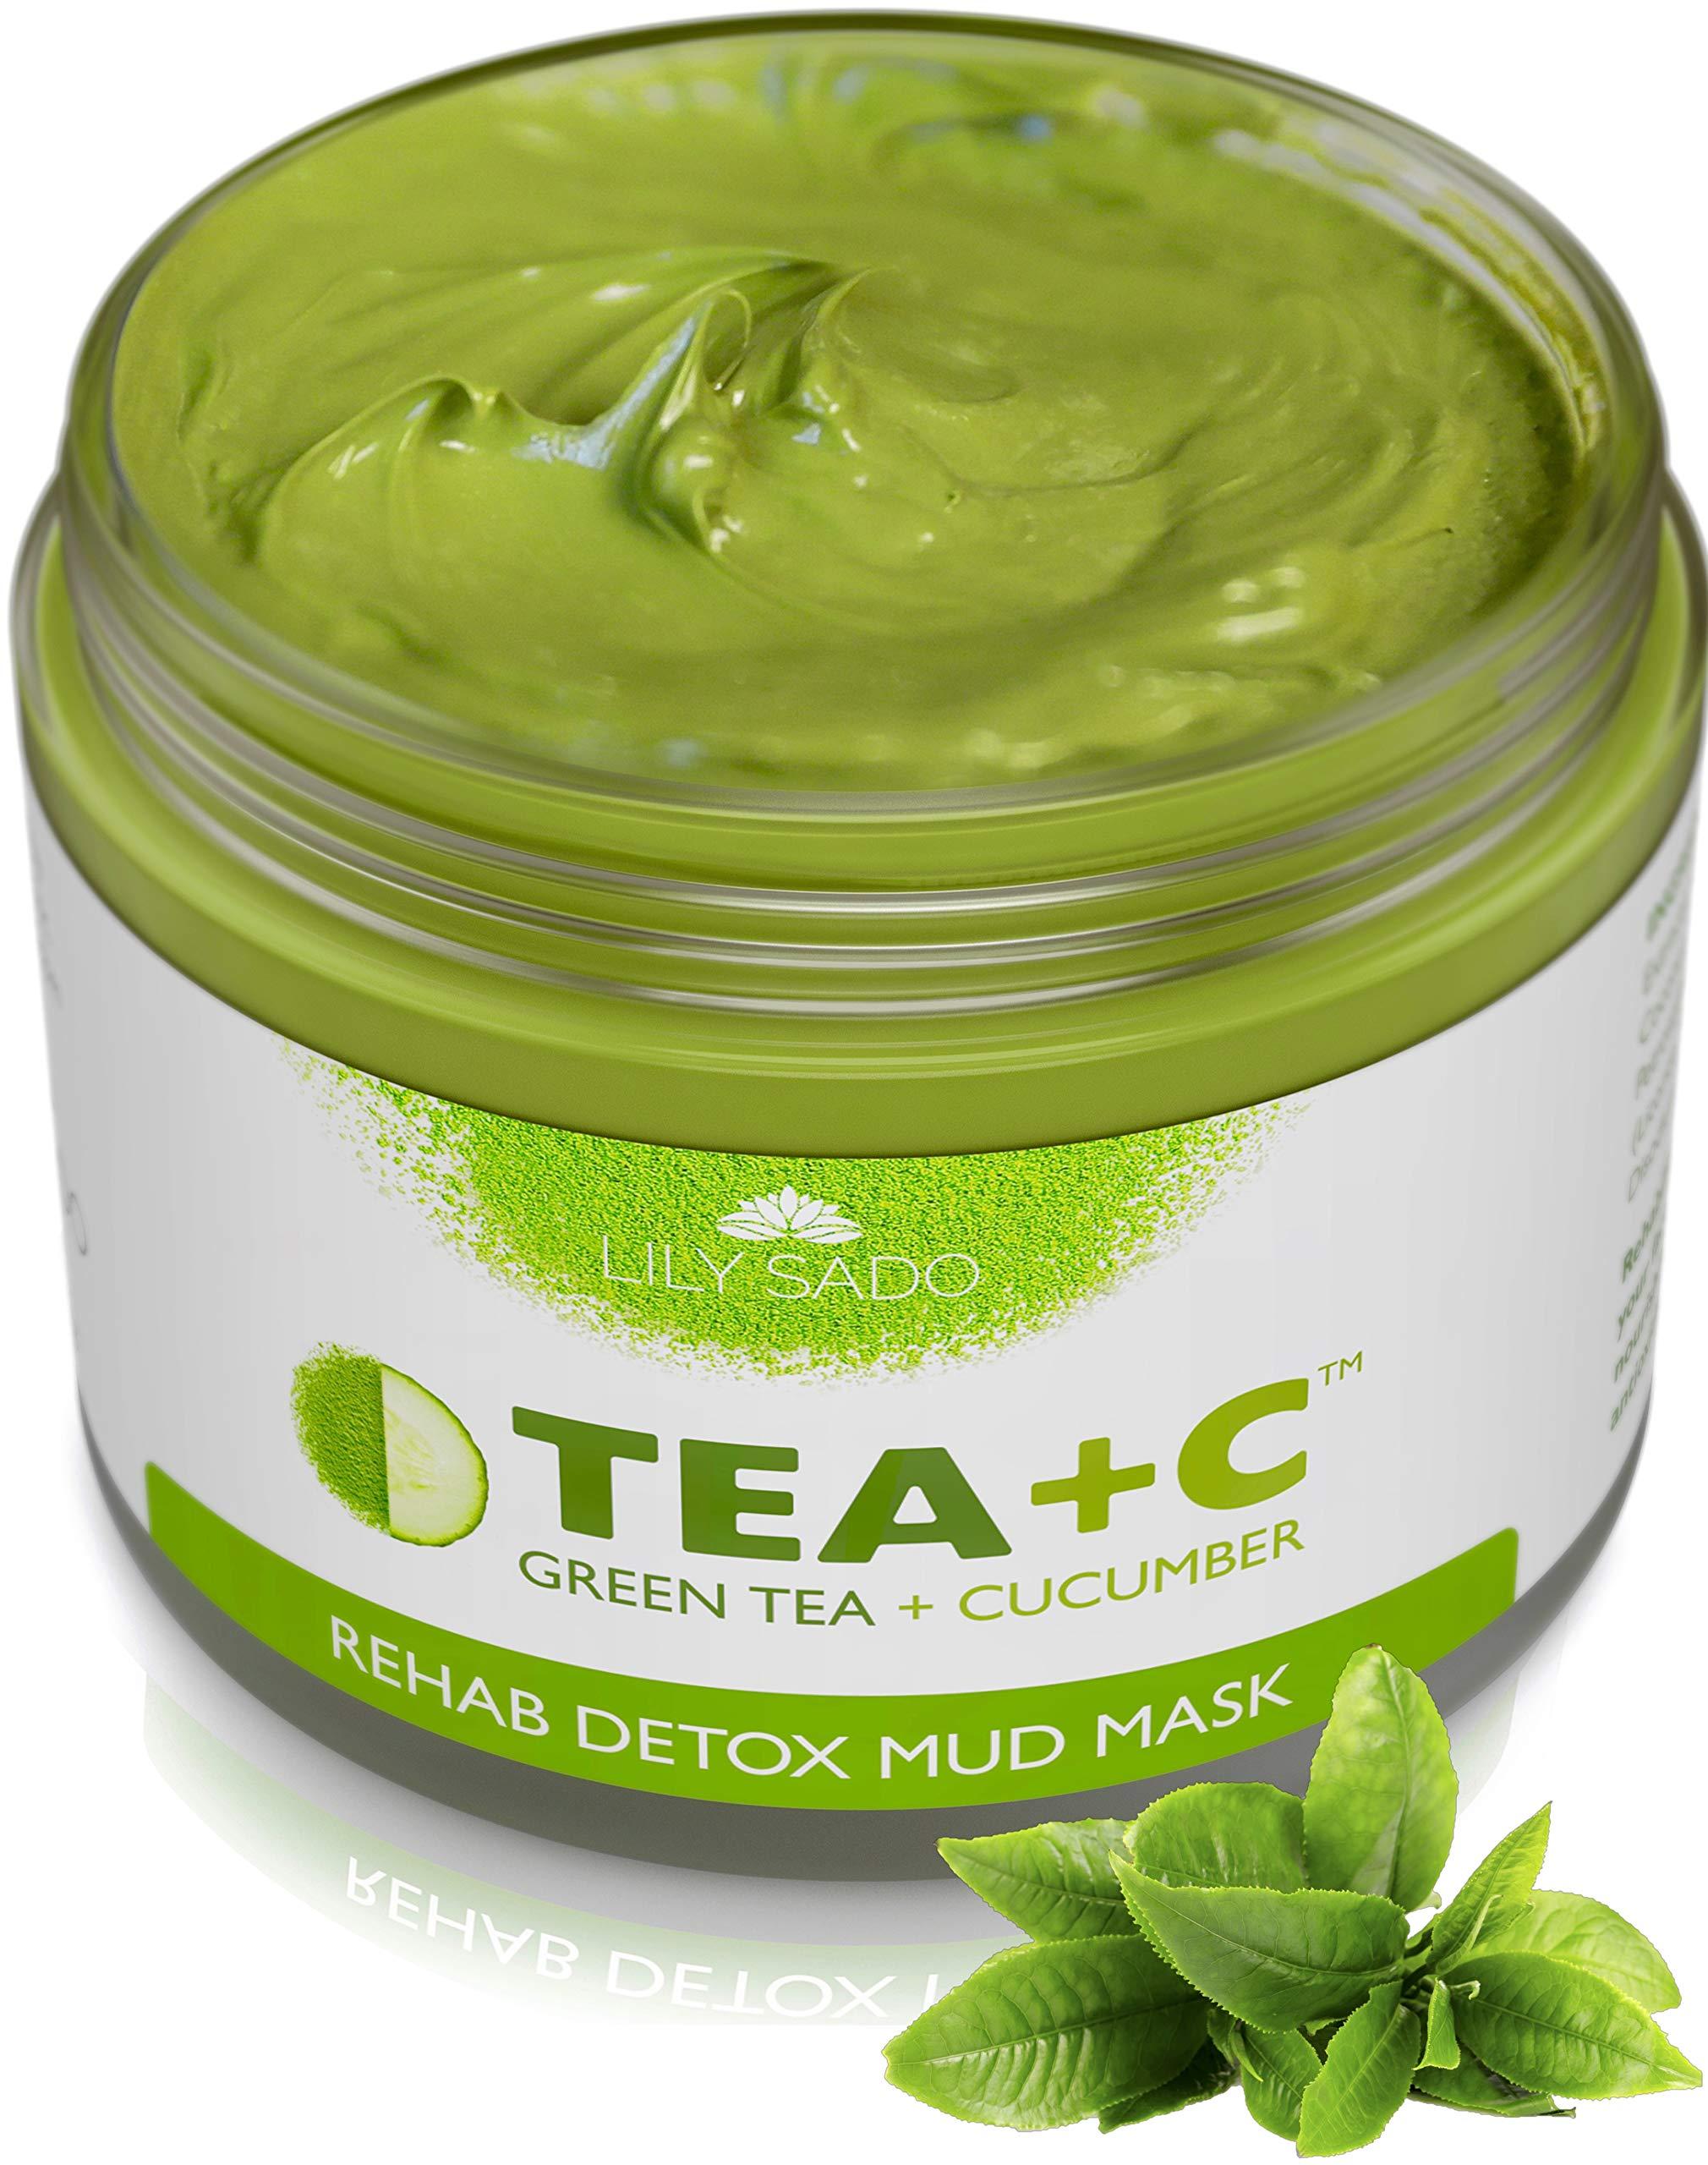 Green Tea Matcha + Cucumber Detox Mud Mask - Natural, Organic & Vegan Face Mask - Anti-Aging, Antioxidant Defense Against Acne, Blackheads & Wrinkles for a Lush, Soft & Glowing Complexion